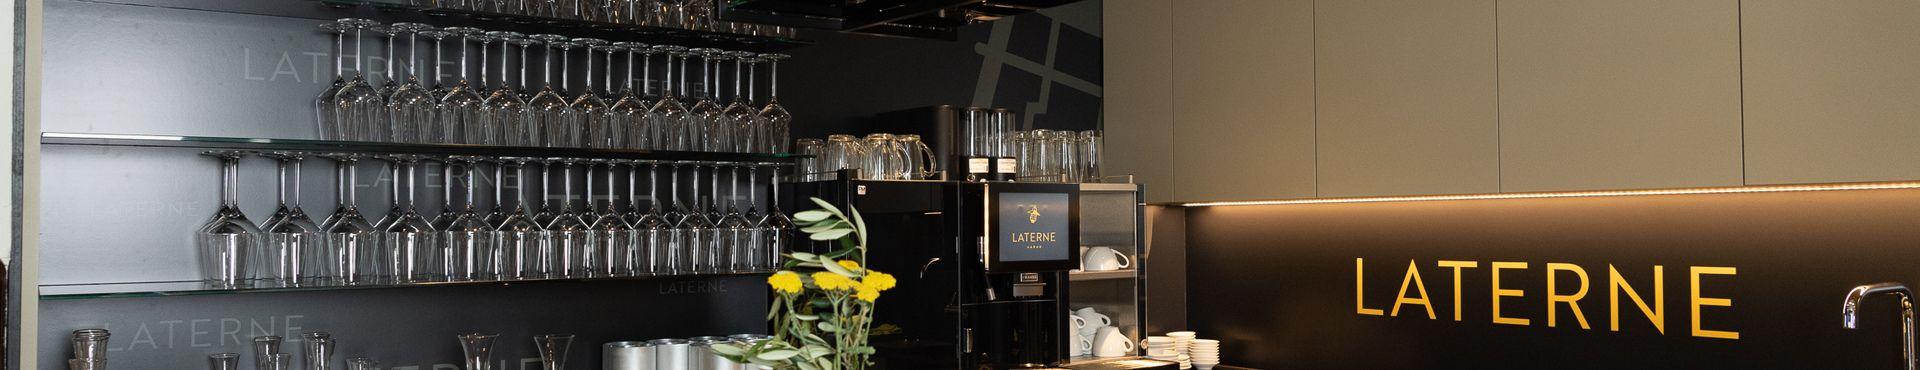 https://cdn.gastronovi.com/tmp/images/laterne-midres-srb-9173_restaurant-laterne-laterne-aarau-theke-aarau-glaeser-schriftzug-laterne-kaffee-bar-laterne-w_1920x370_of_904073989cd47be4.jpg